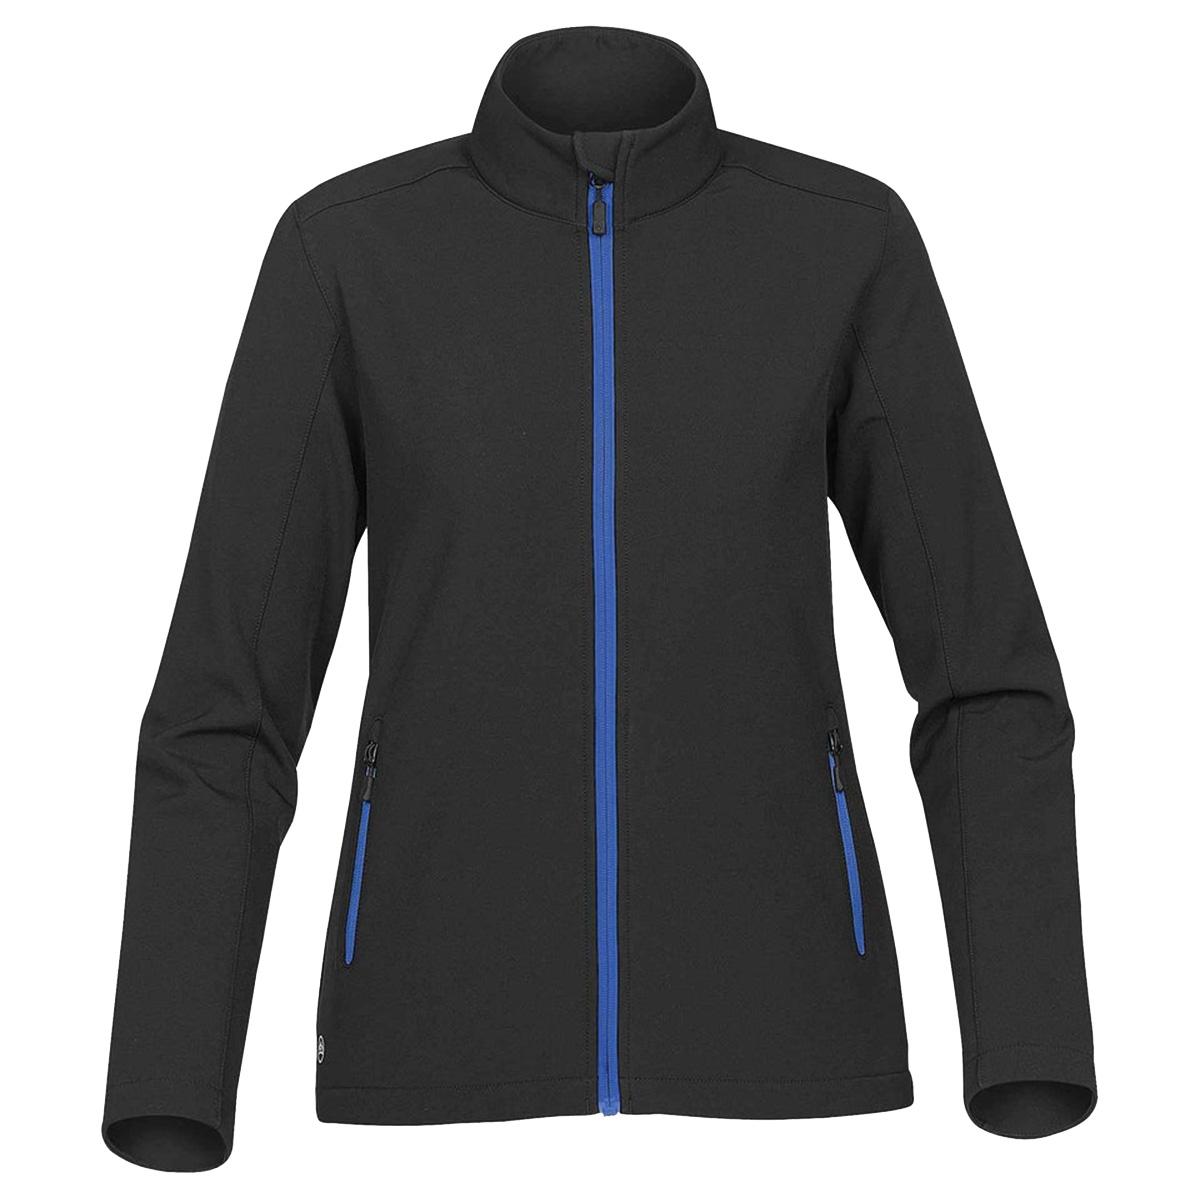 Stormtech Womens/Ladies Orbiter Softshell Jacket (XL) (Black/ Azure Blue)